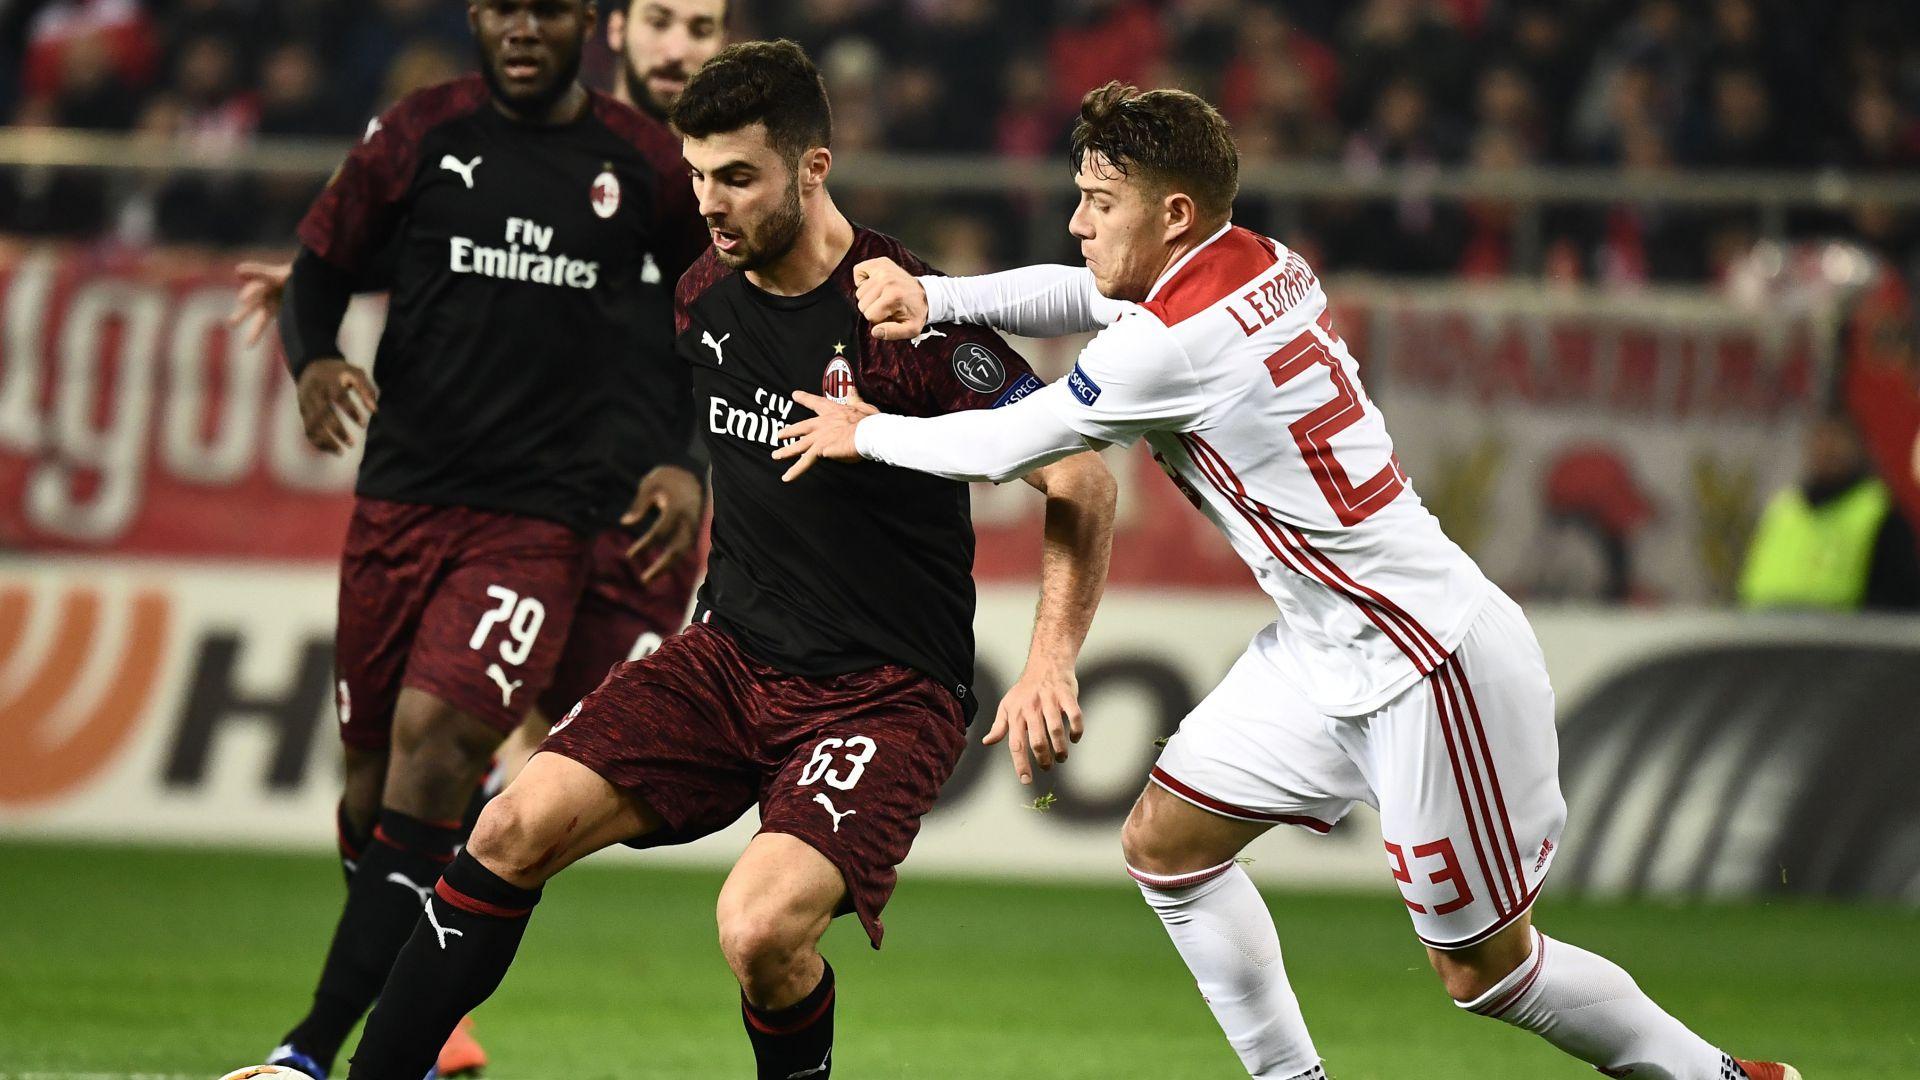 Ligue Europa, Gattuso présente ses excuses — AC Milan